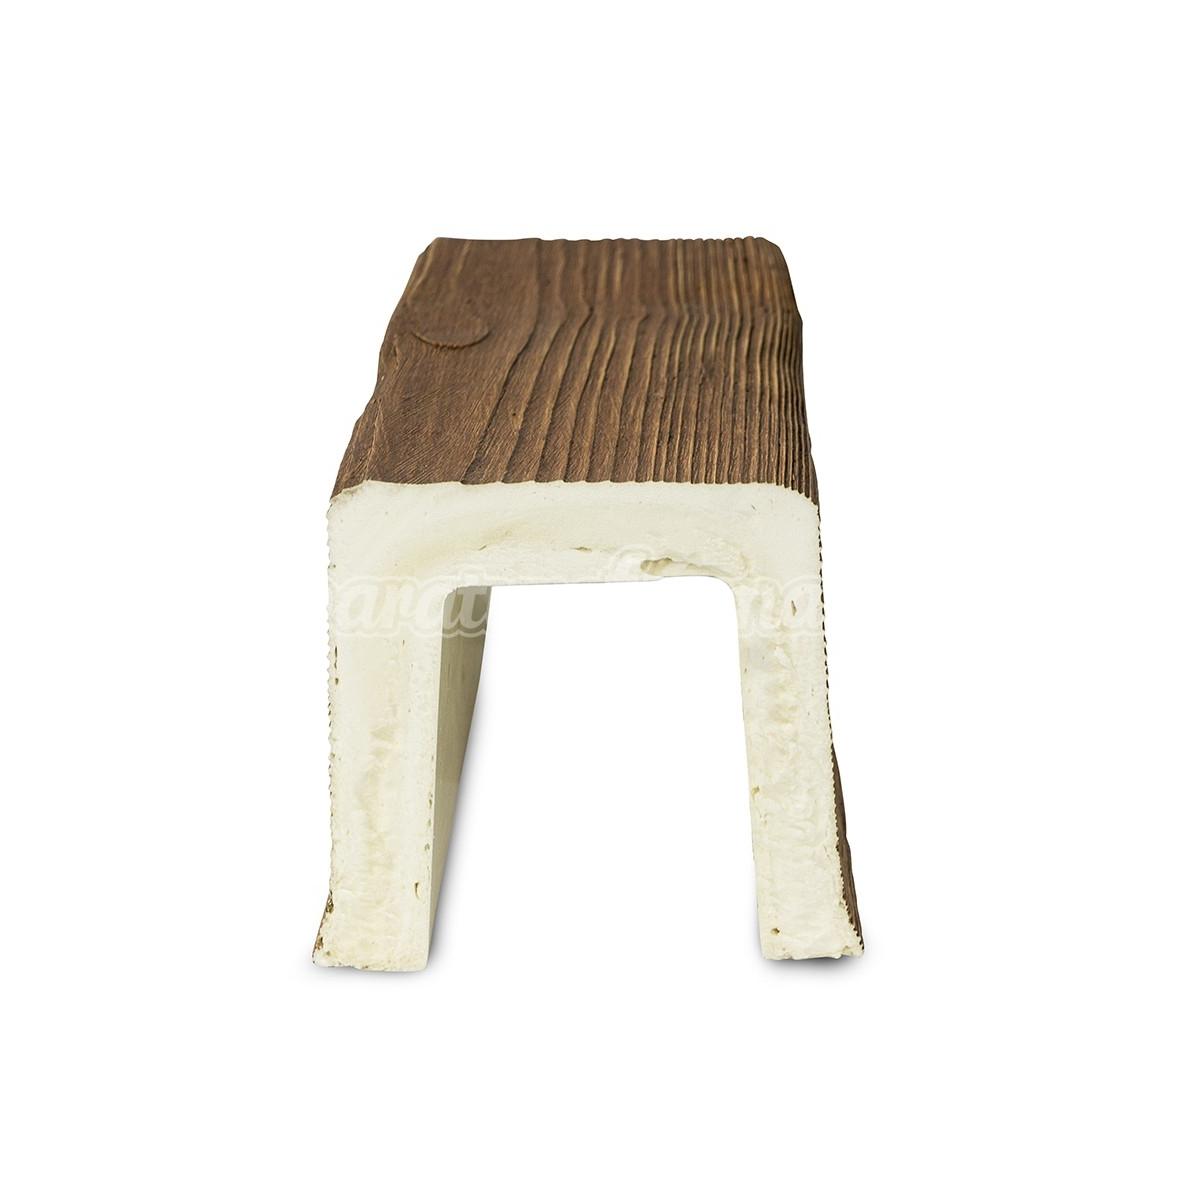 Viga imitación a madera 300x10x10 Grupo Unamacor